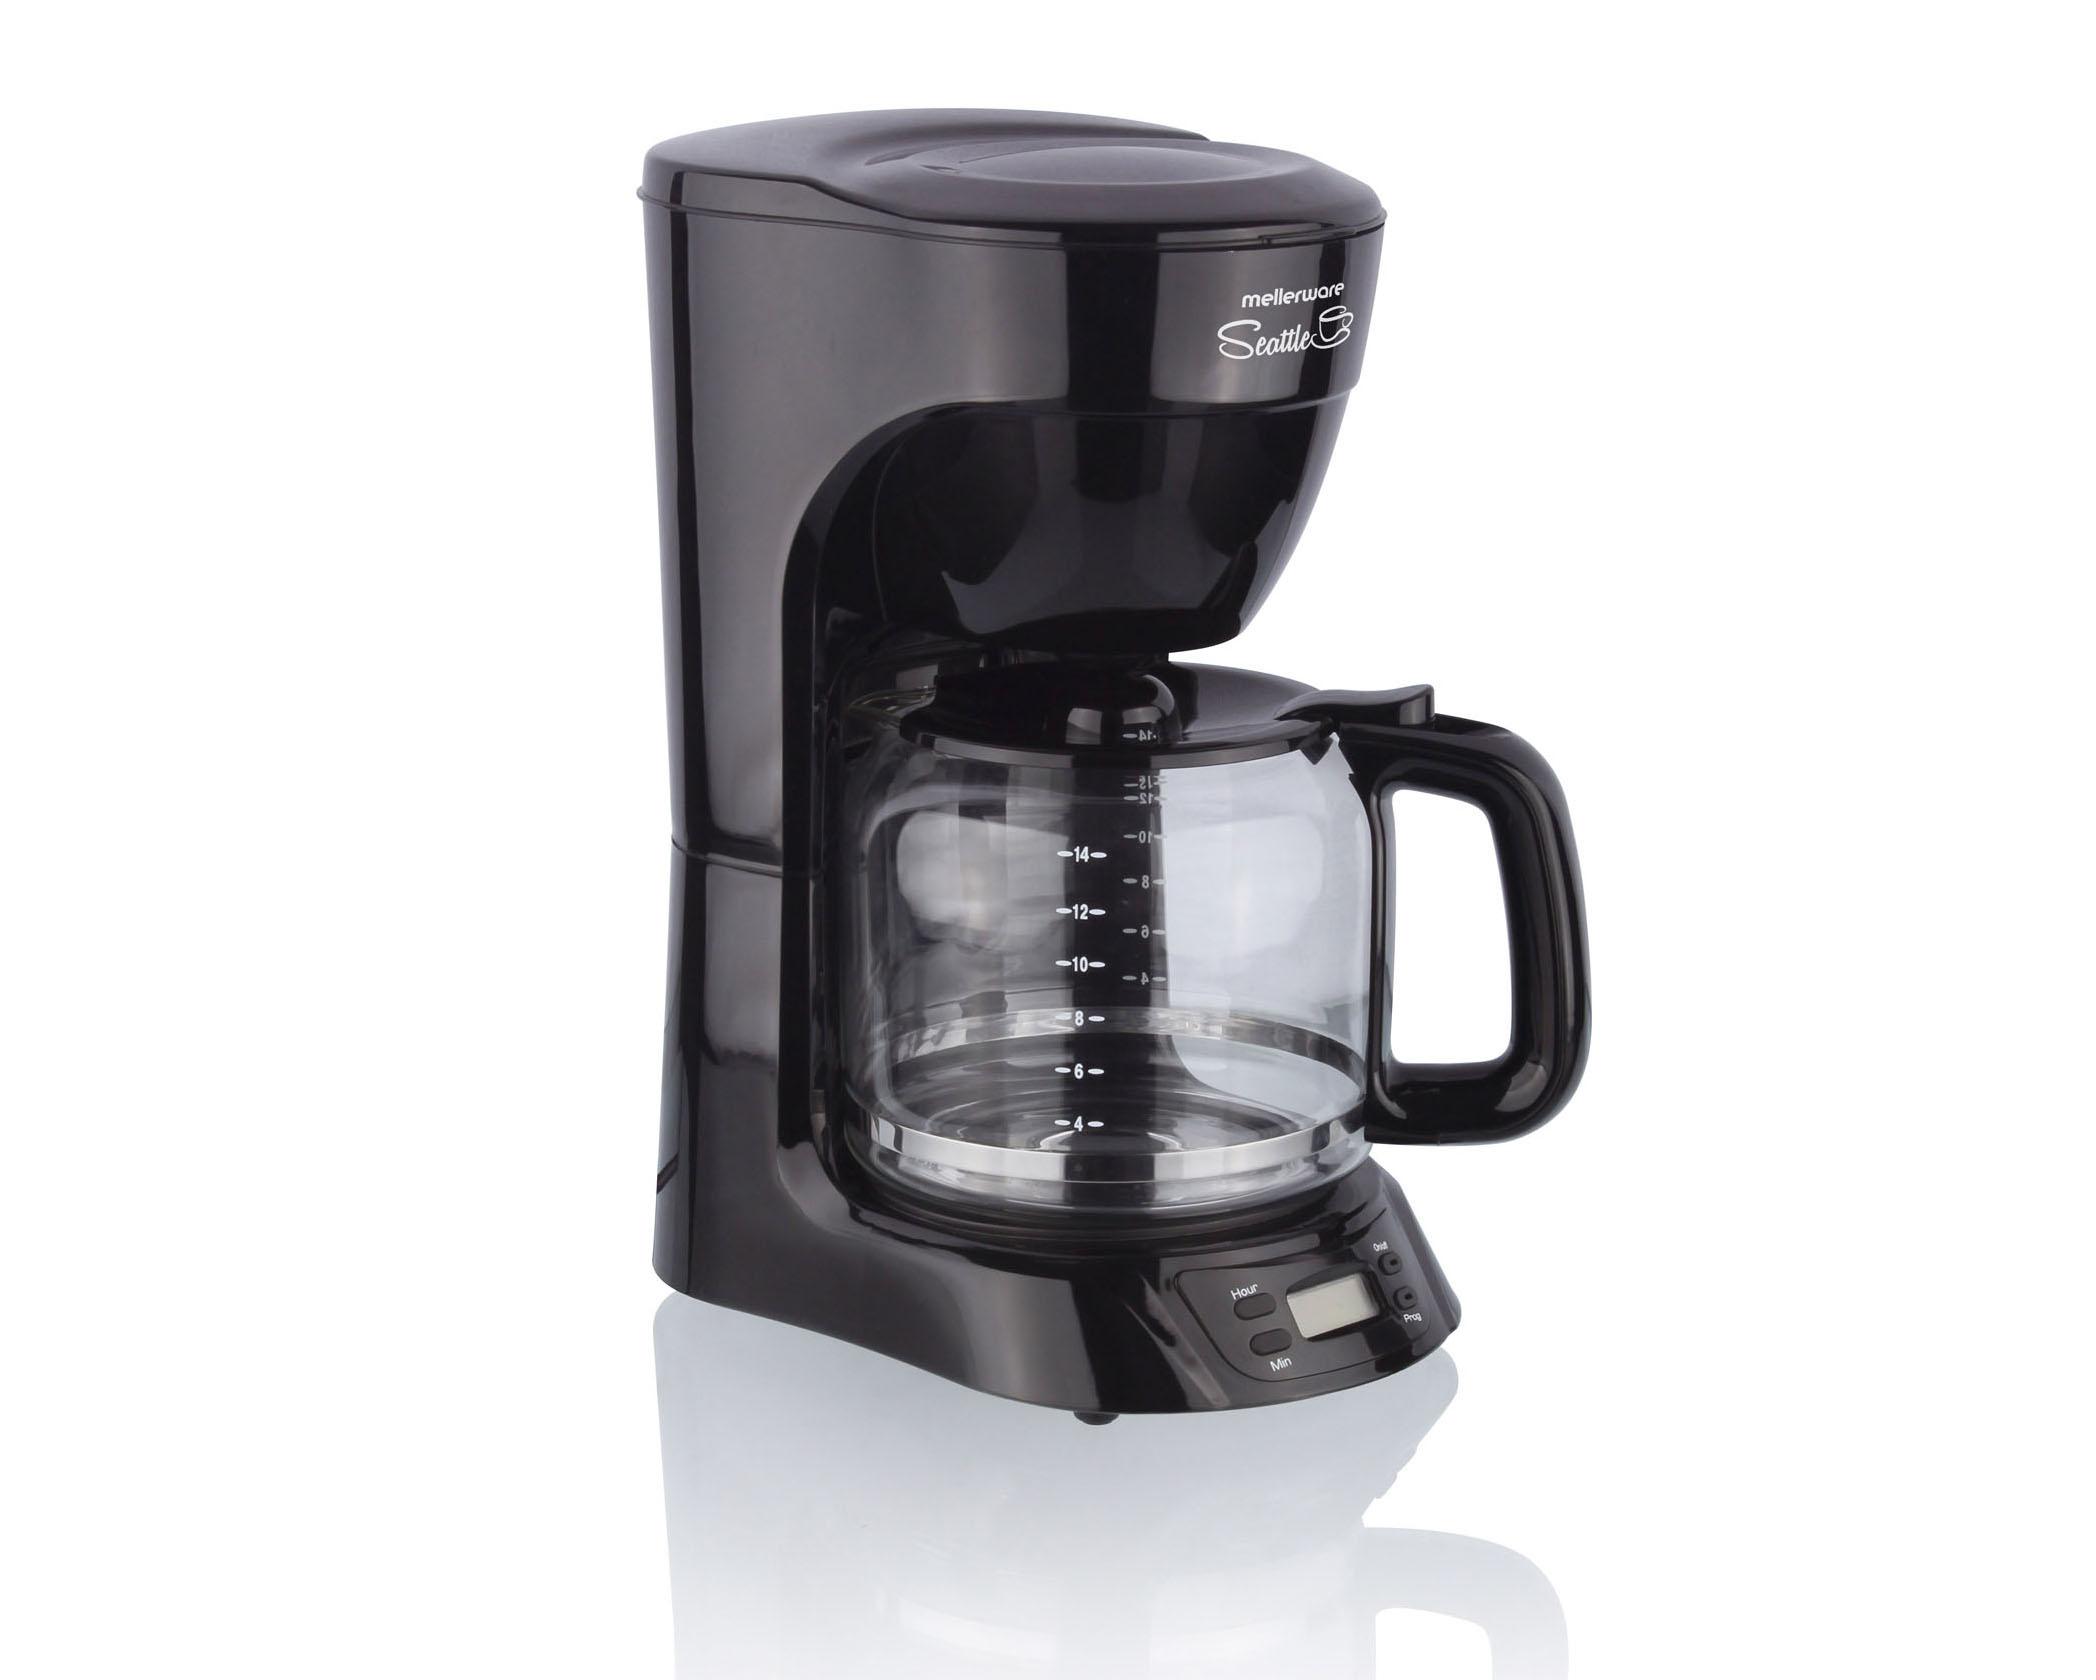 Seattle Drip Digital Filter Coffee Machine